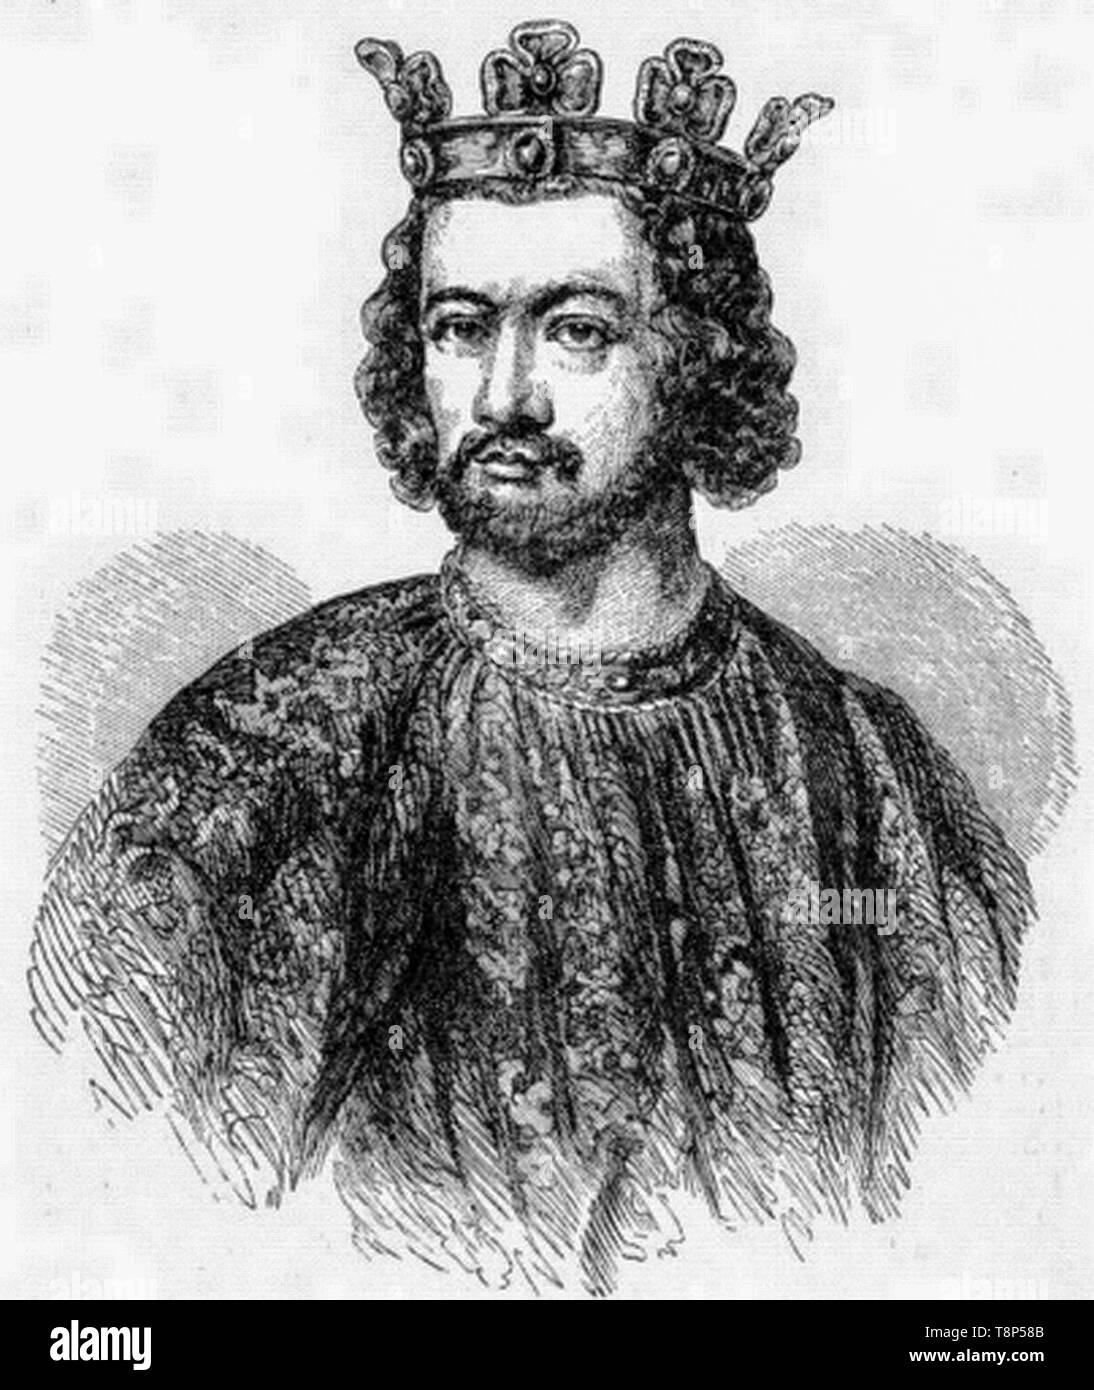 King John, King of England, portrait engraving, 1865 - Stock Image